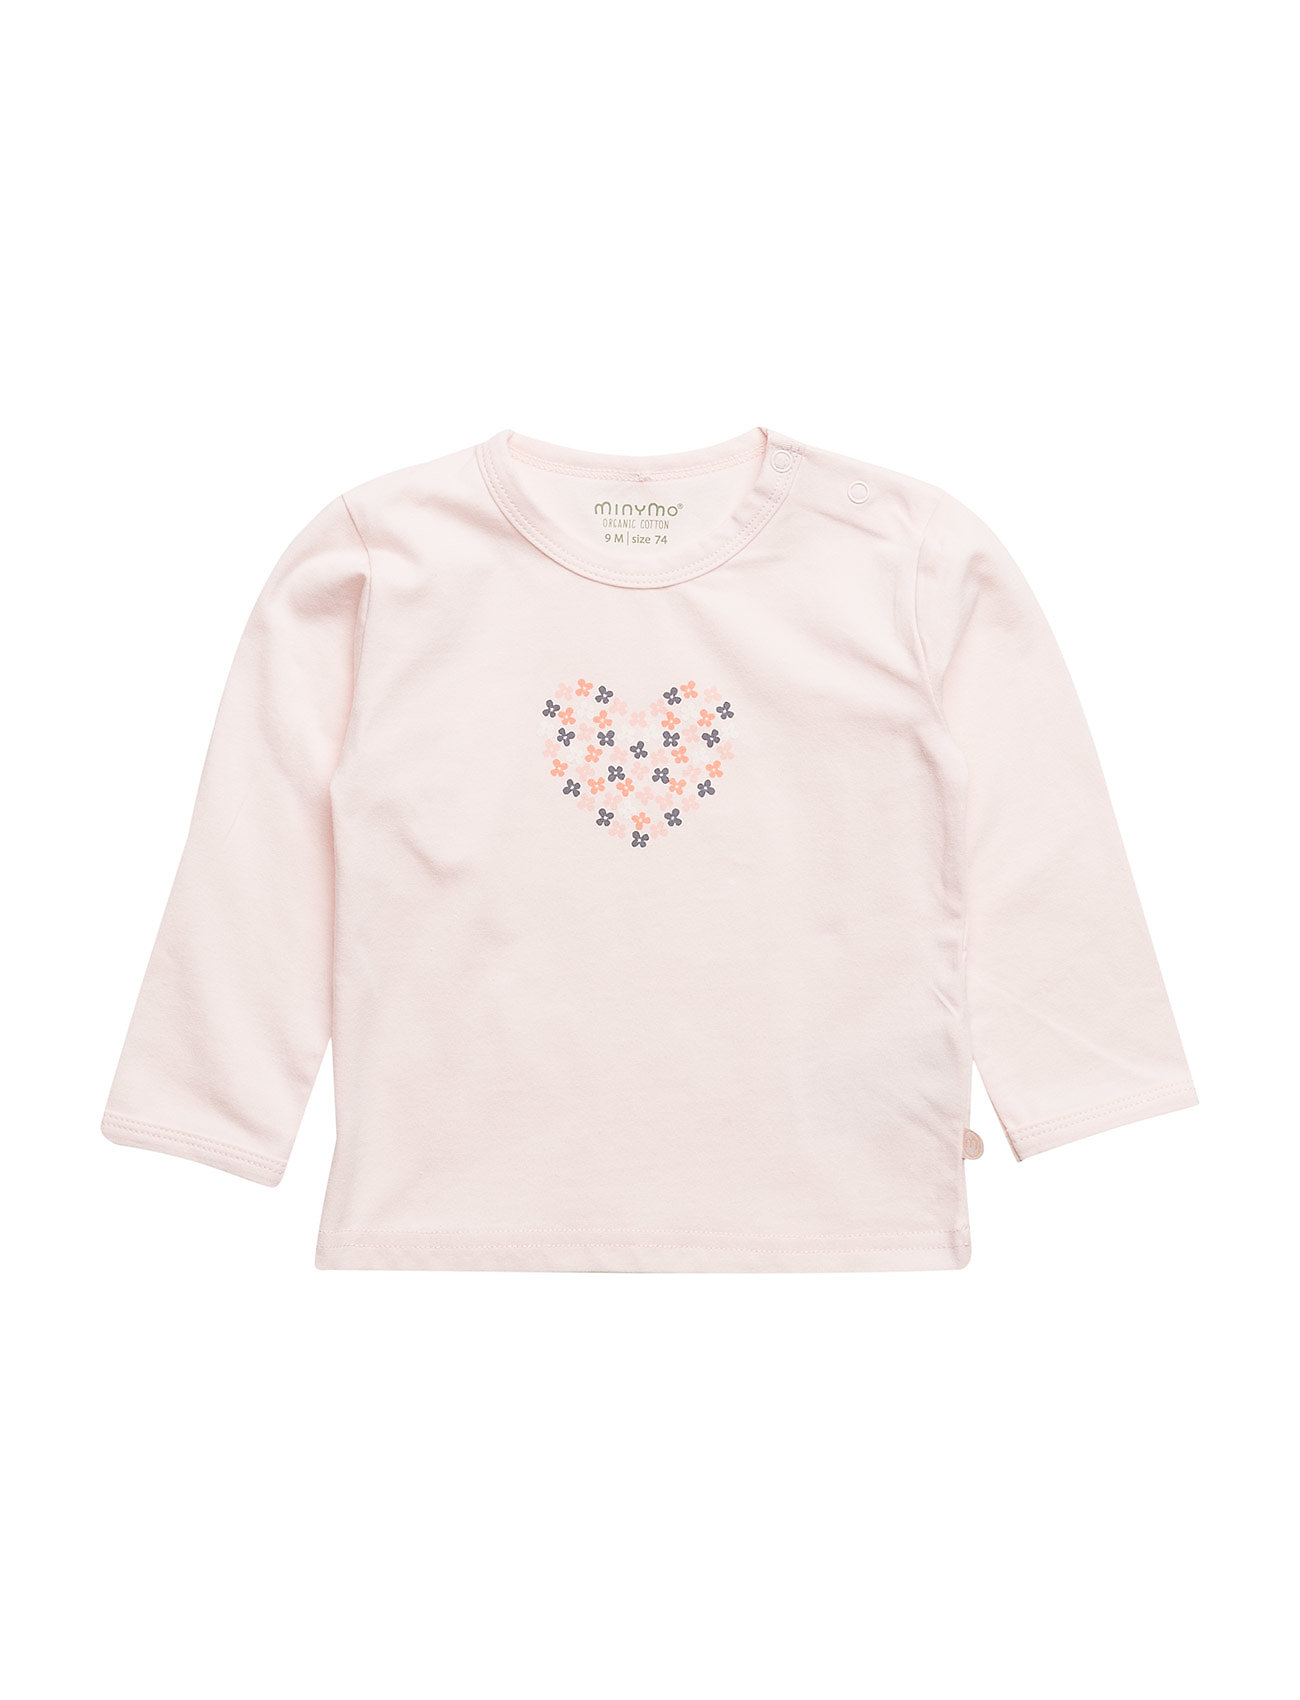 Minymo T-shirt LS w. print - PEACH BLUSH